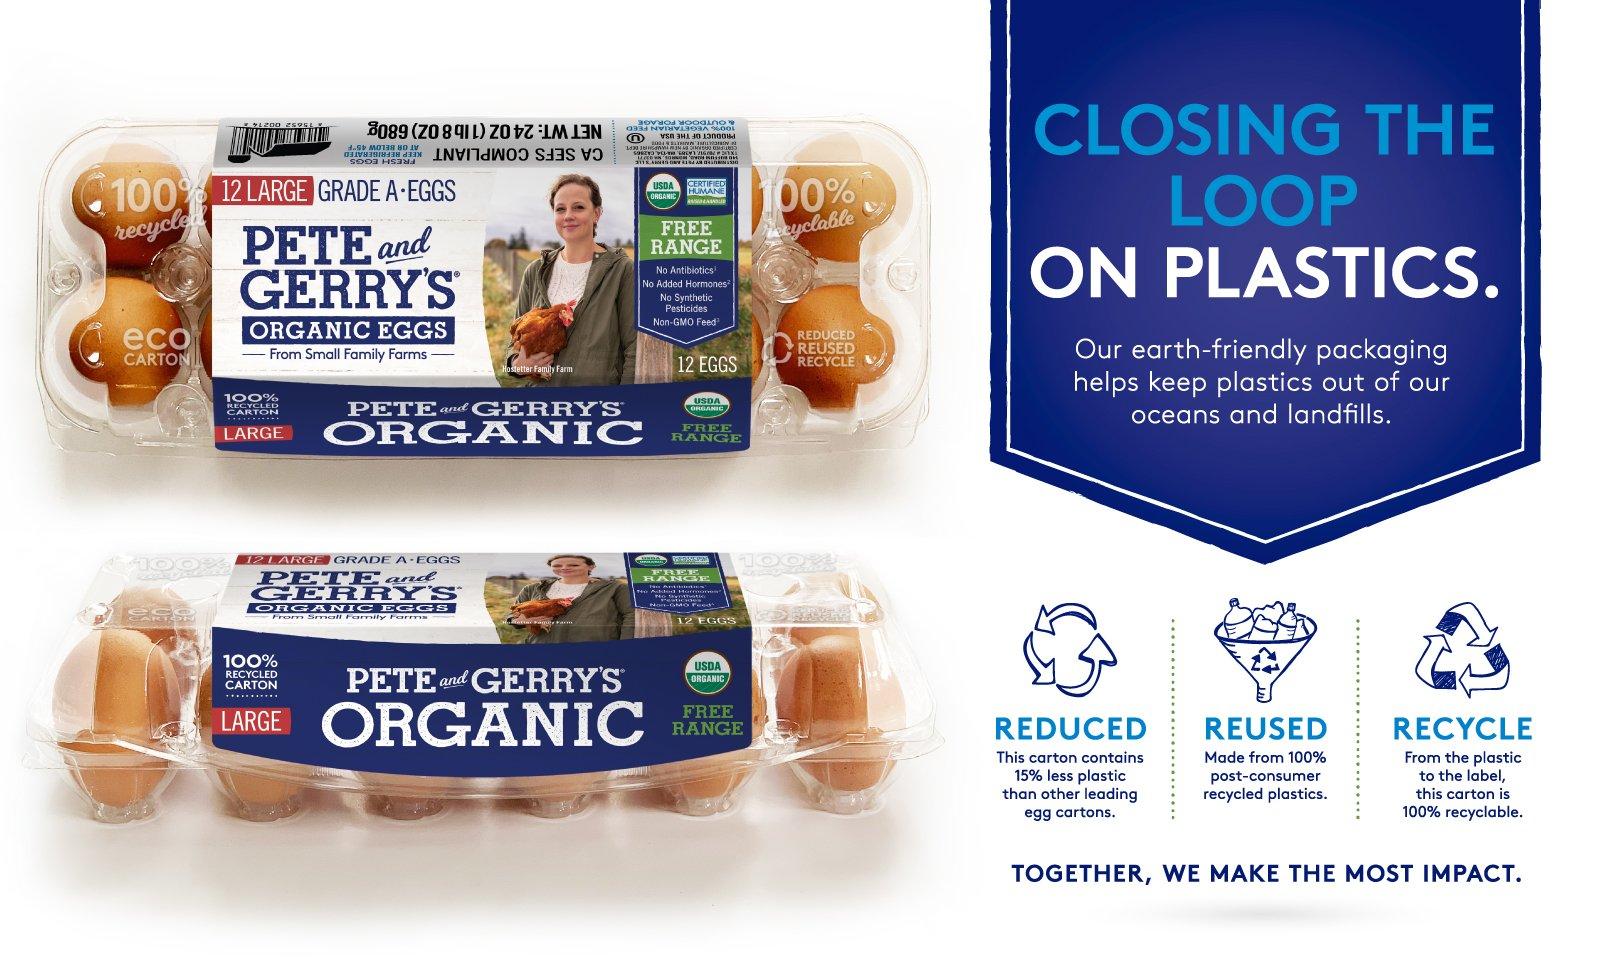 Closing the Loop on Plastics